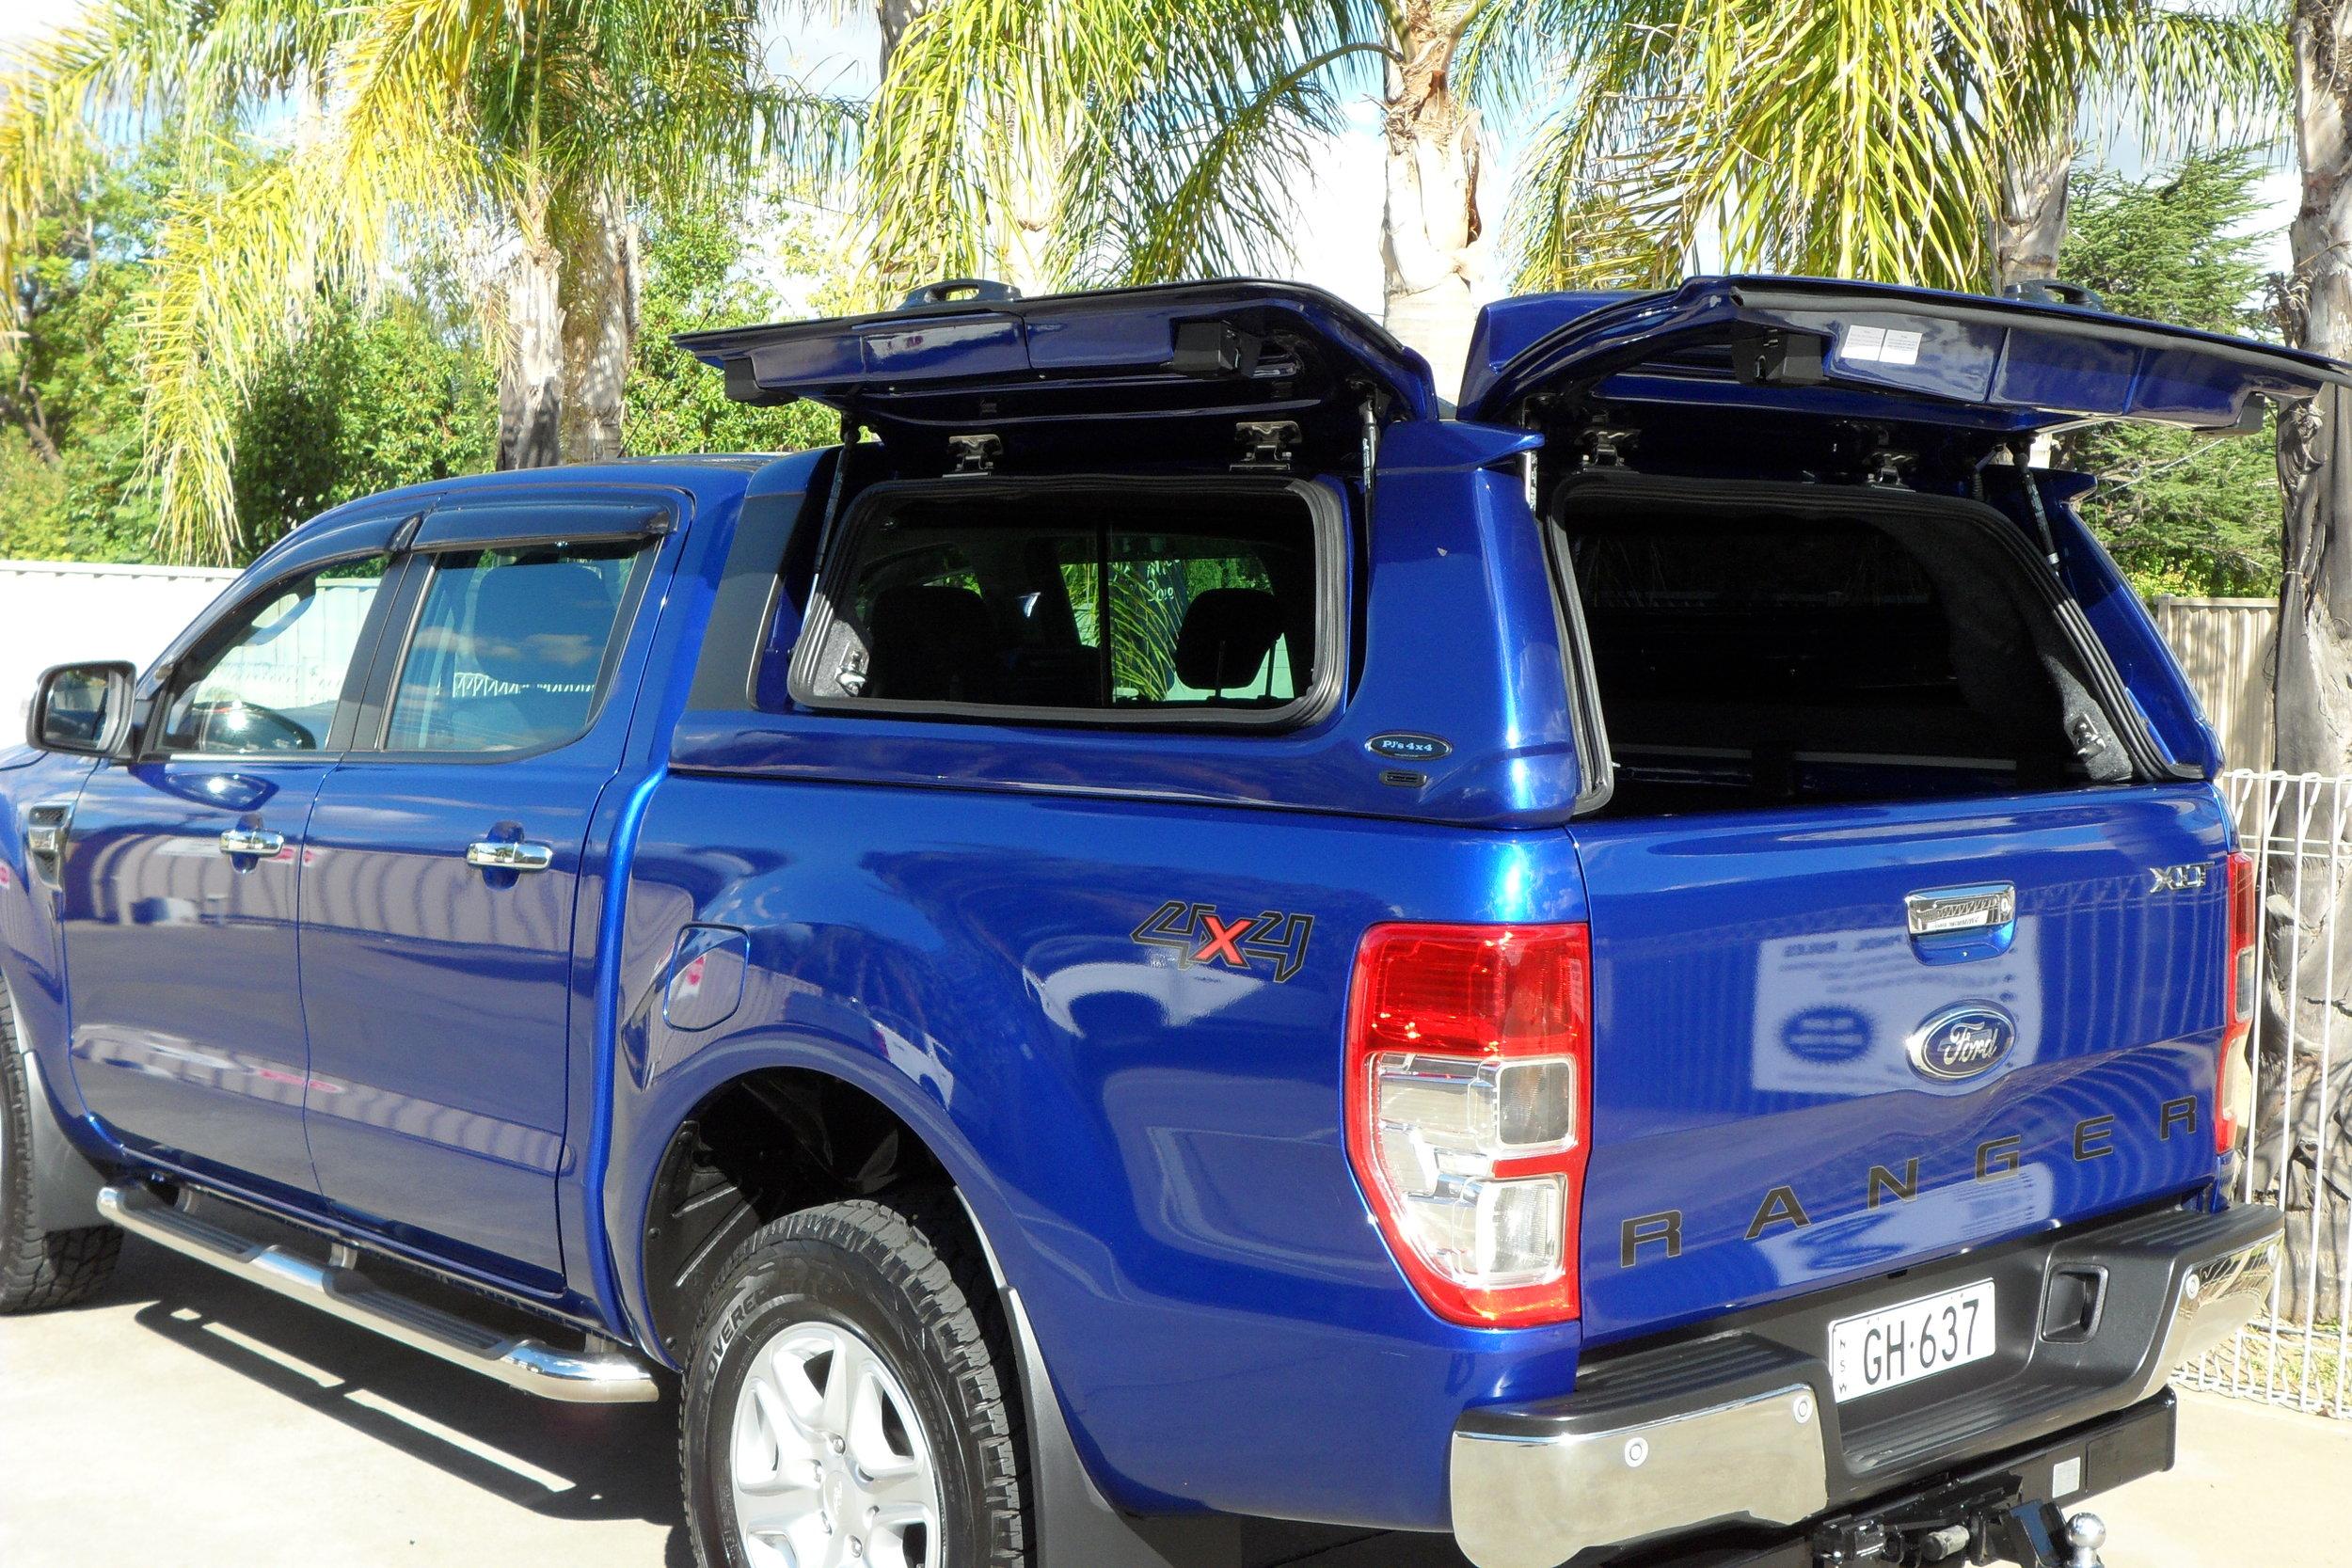 Ford Ranger Twentyten canopy Aurora Blue 9.JPG